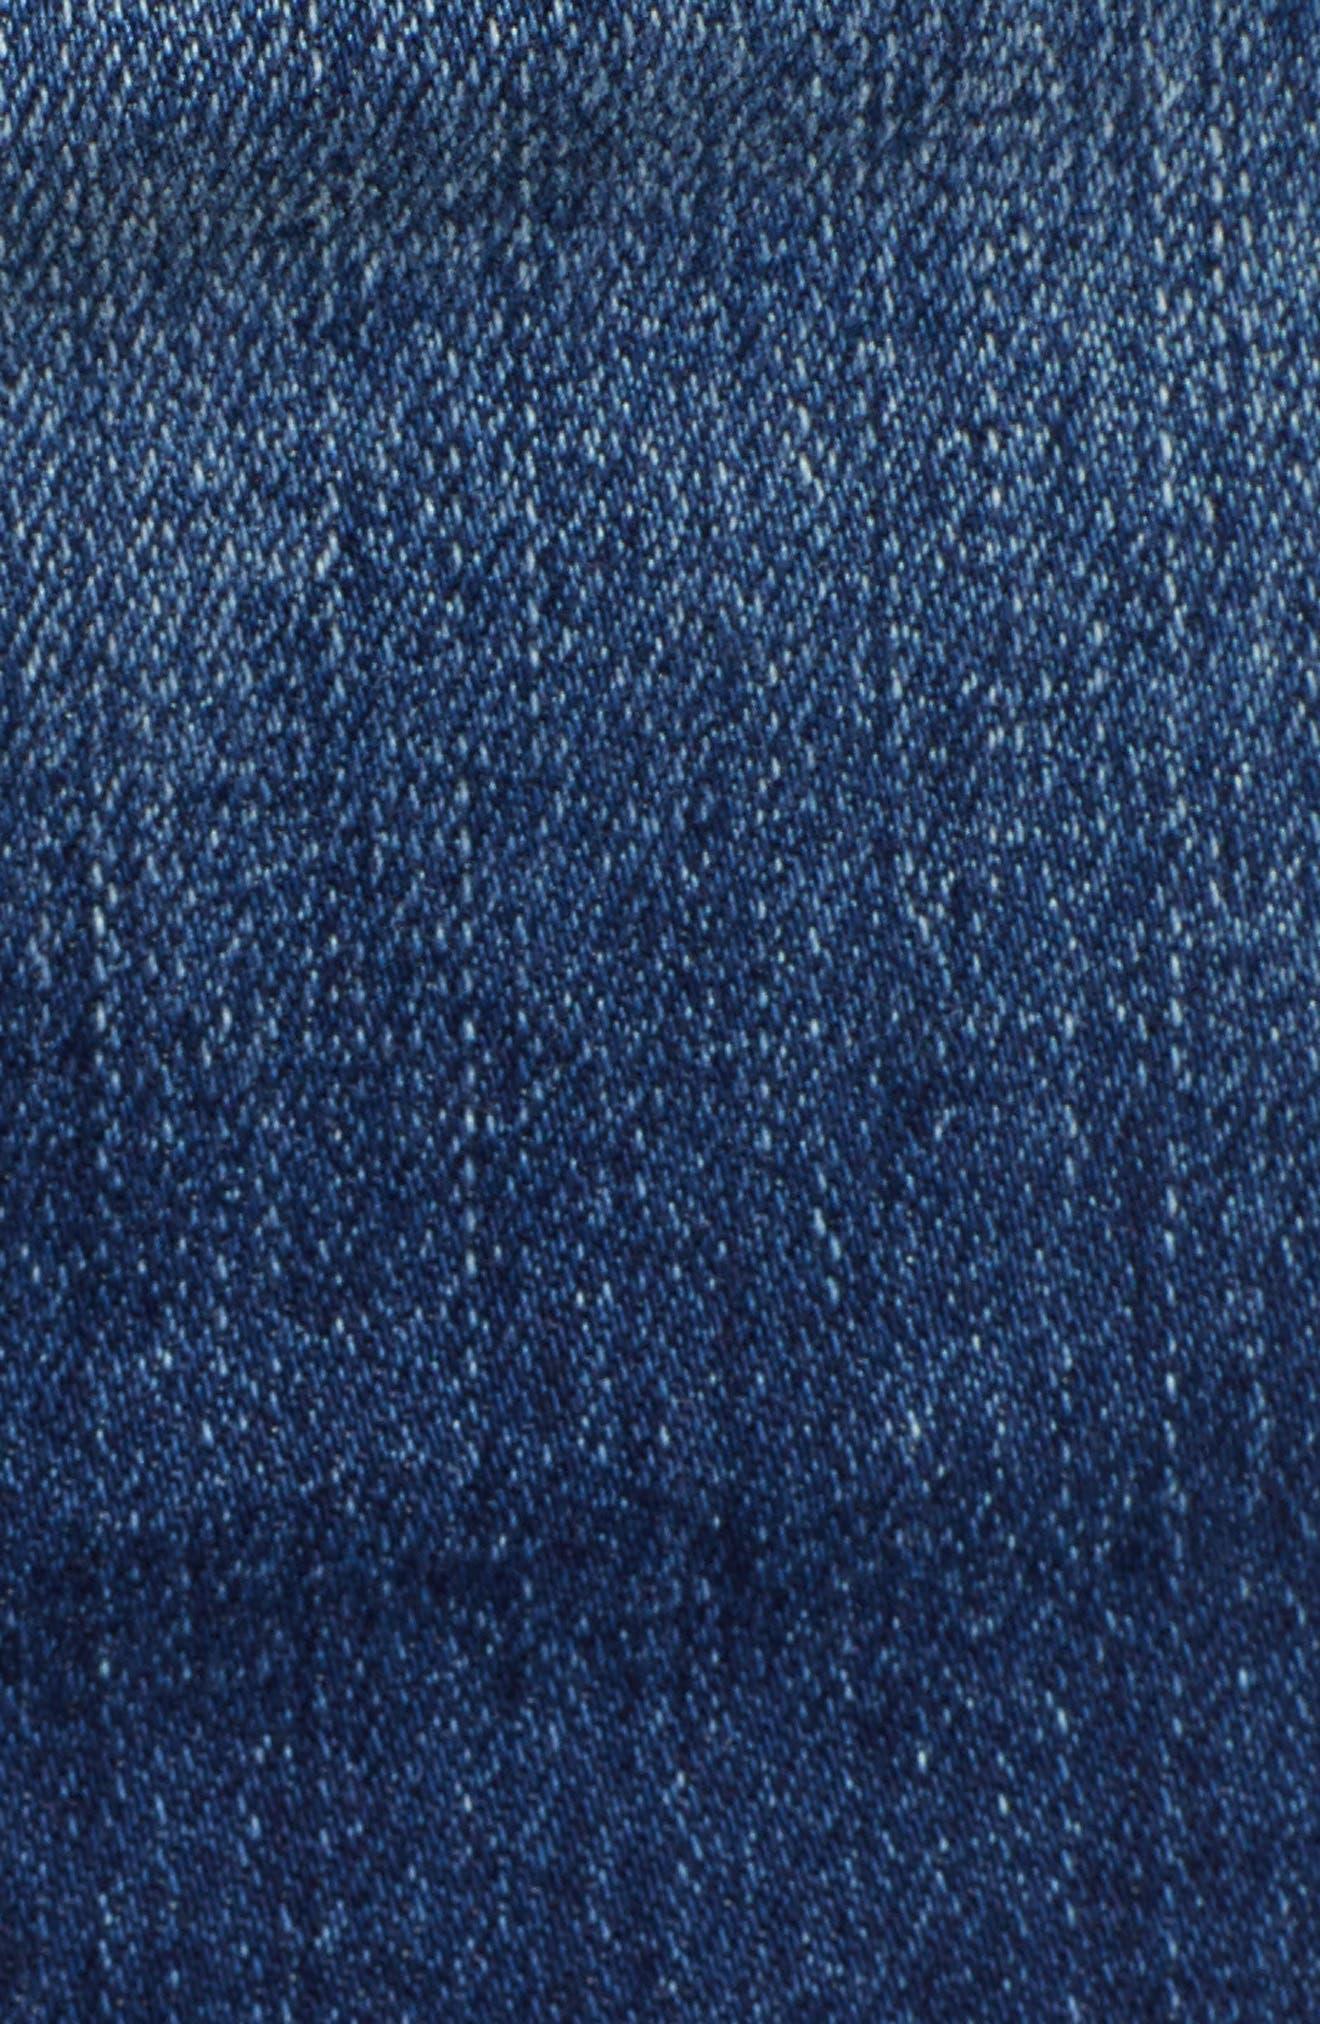 JAG JEANS, Hanna Stretch Straight Leg Jeans, Alternate thumbnail 6, color, MED INDIGO